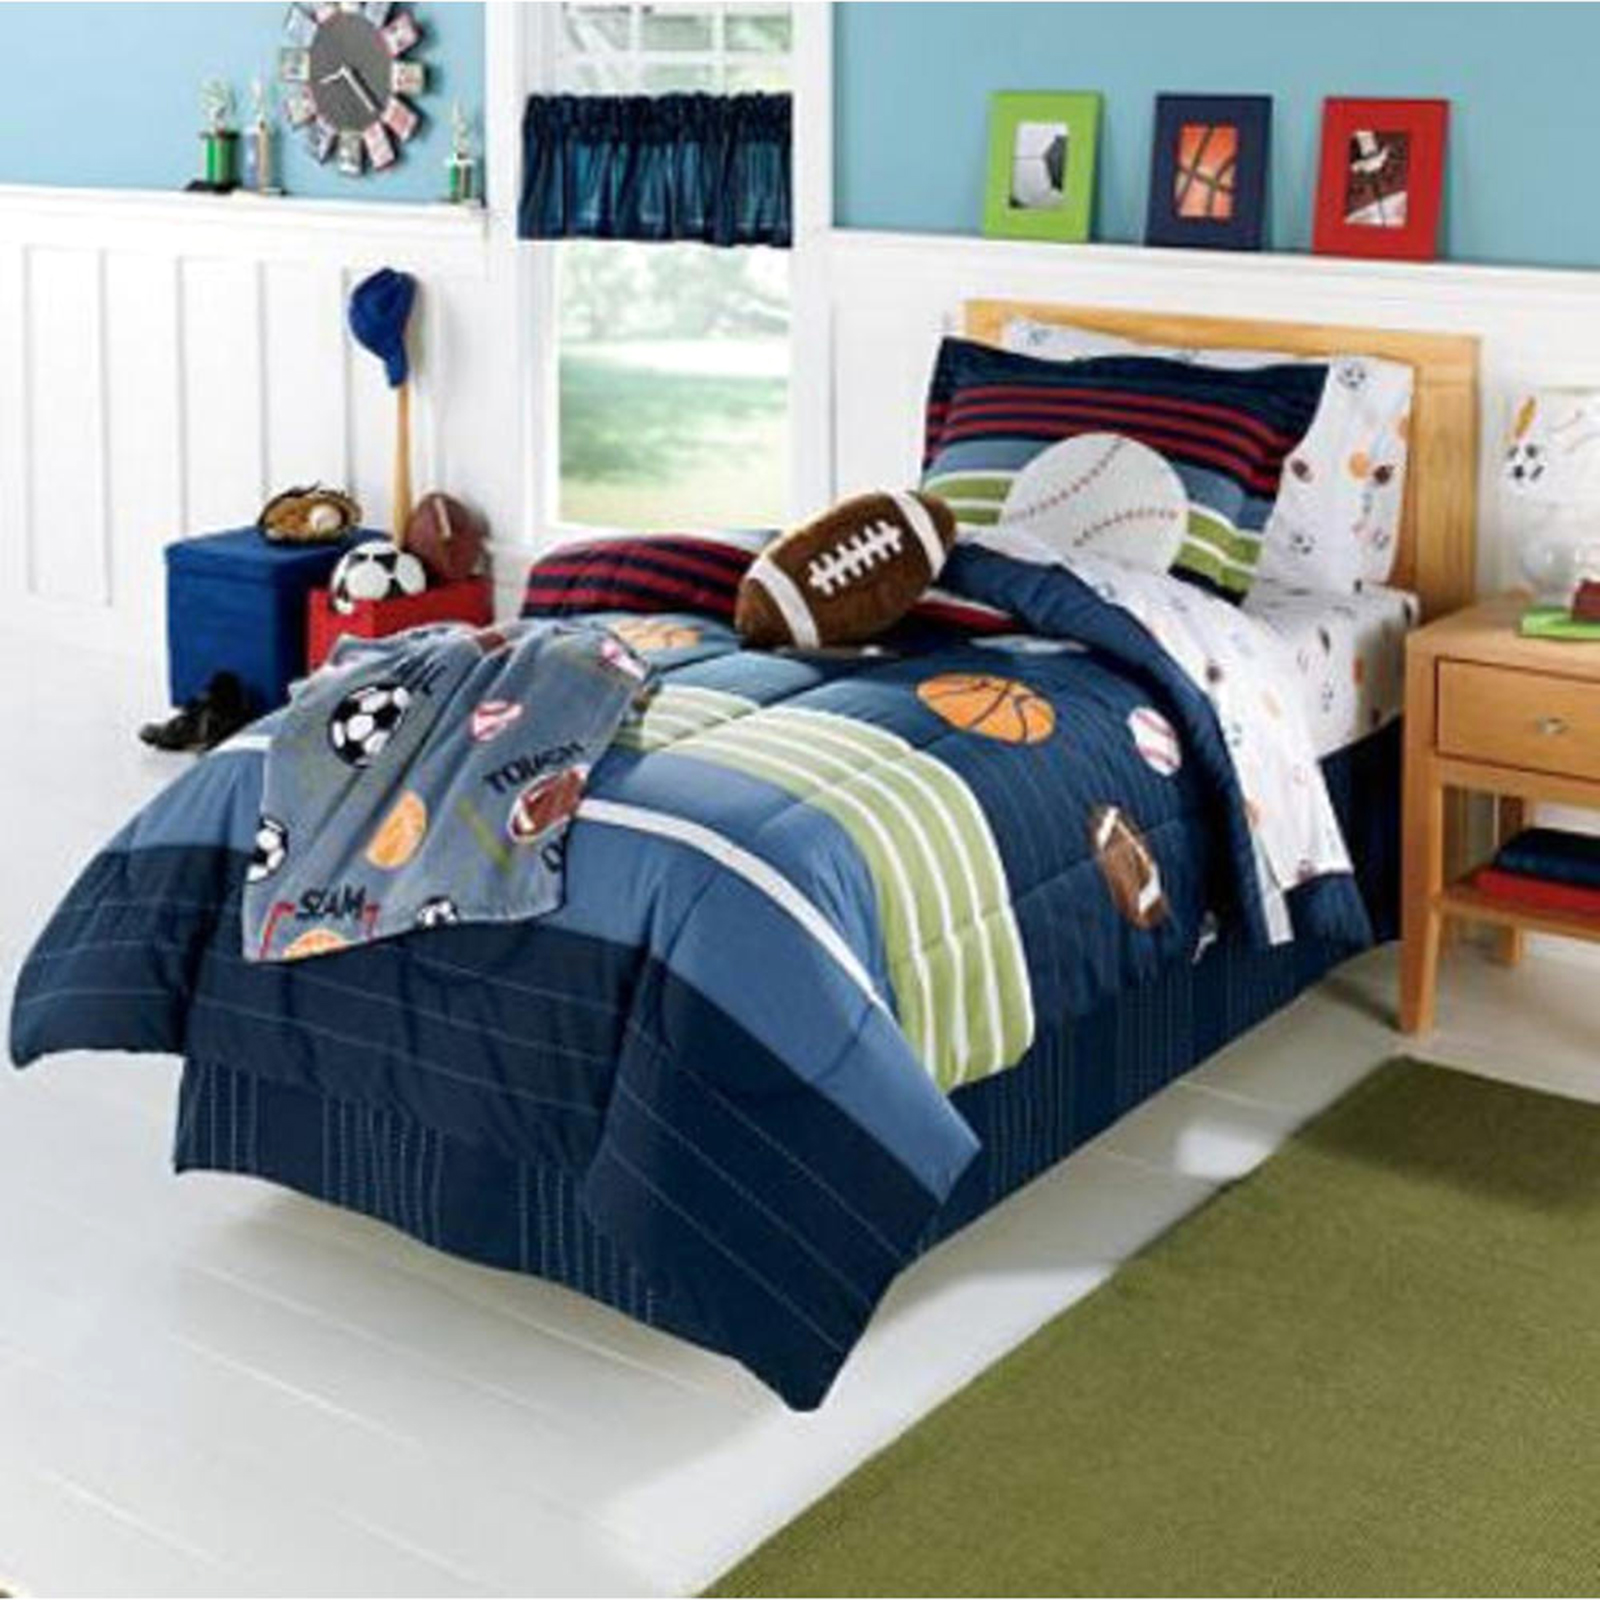 Kids Bedding Mvp Sports Boys Twin Comforter Set - Sears Marketplace